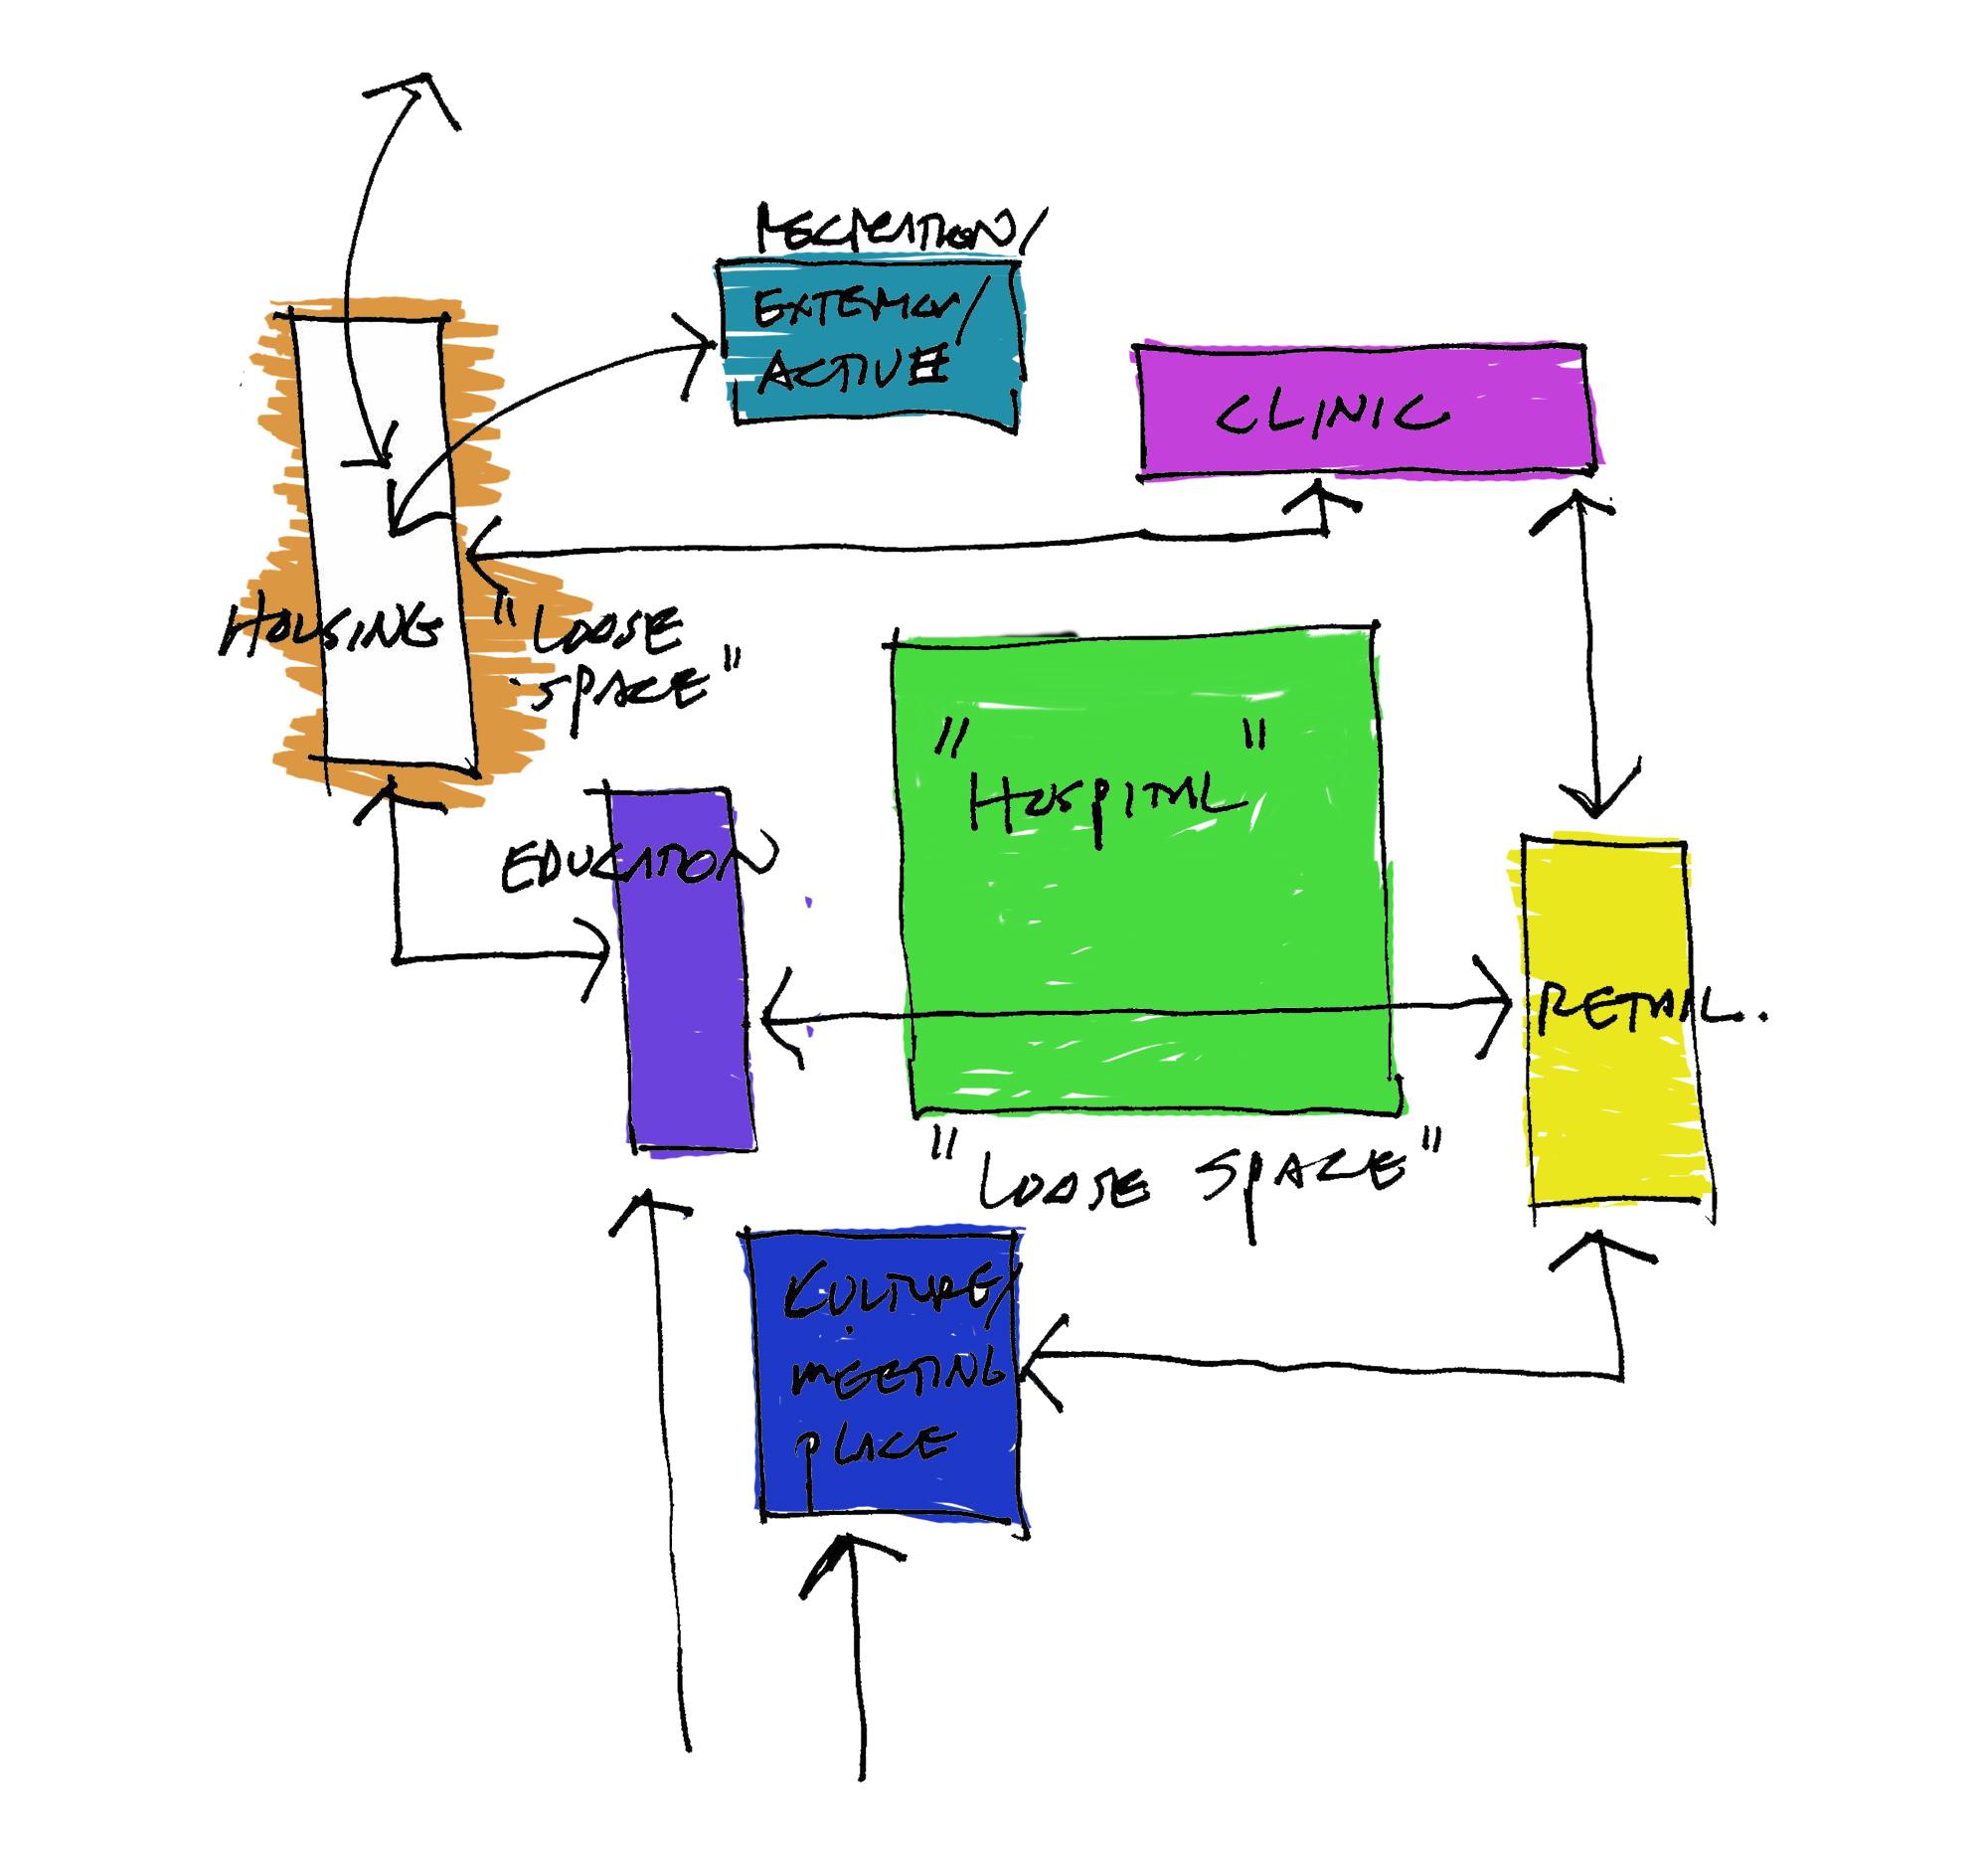 Building layout sketch